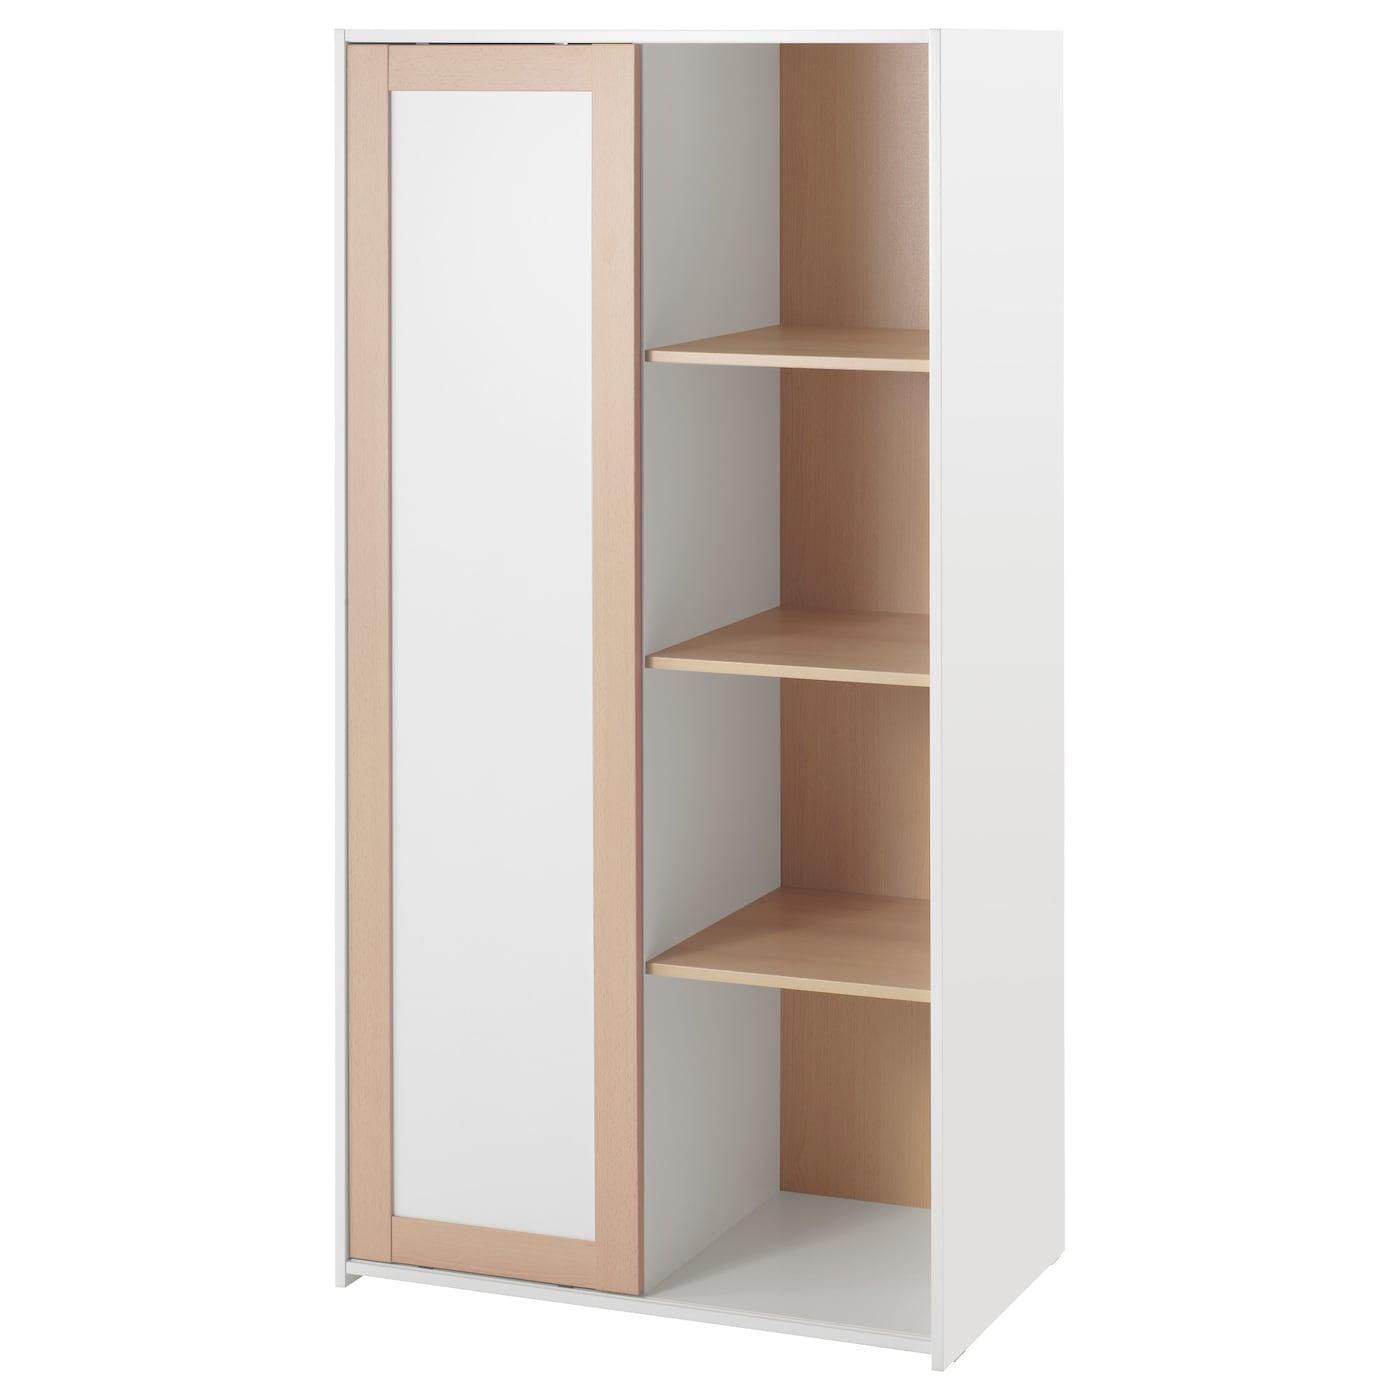 sniglar armoire h tre blanc 81x50x163 cm ikea. Black Bedroom Furniture Sets. Home Design Ideas